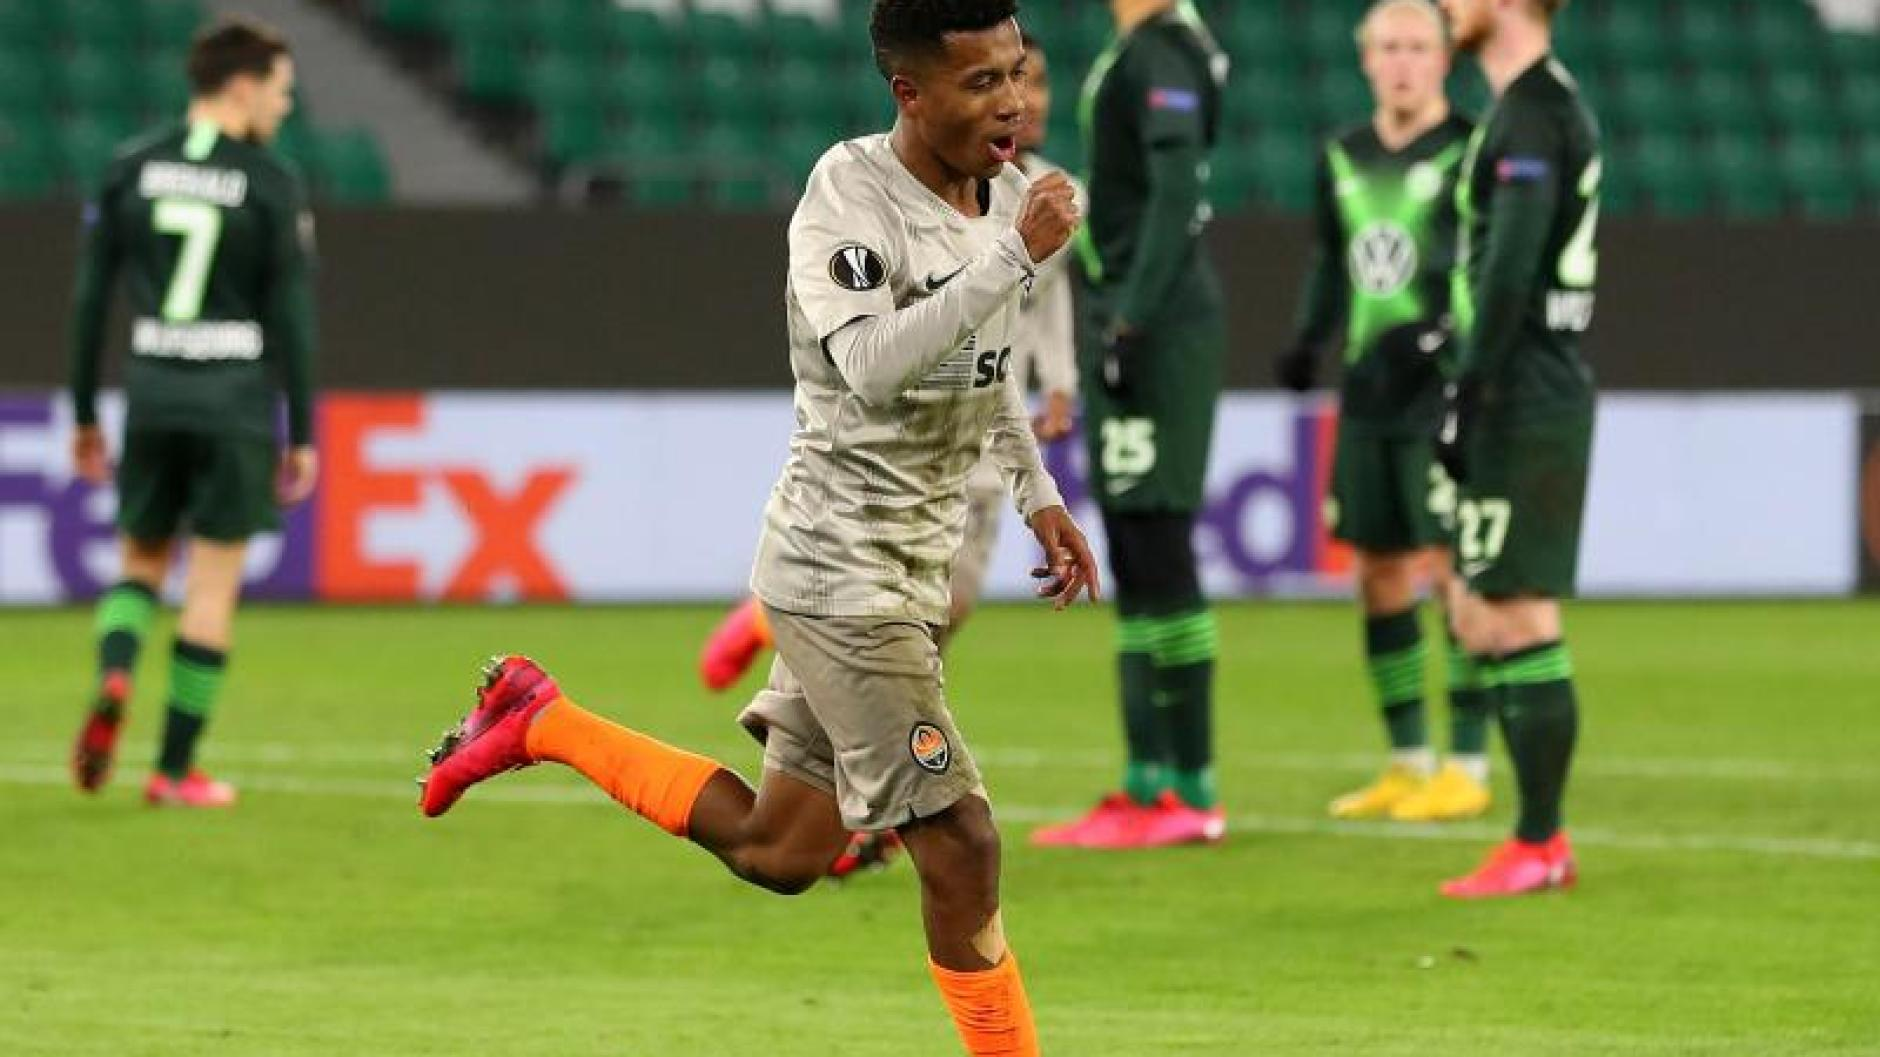 Europa League übertragung Free Tv